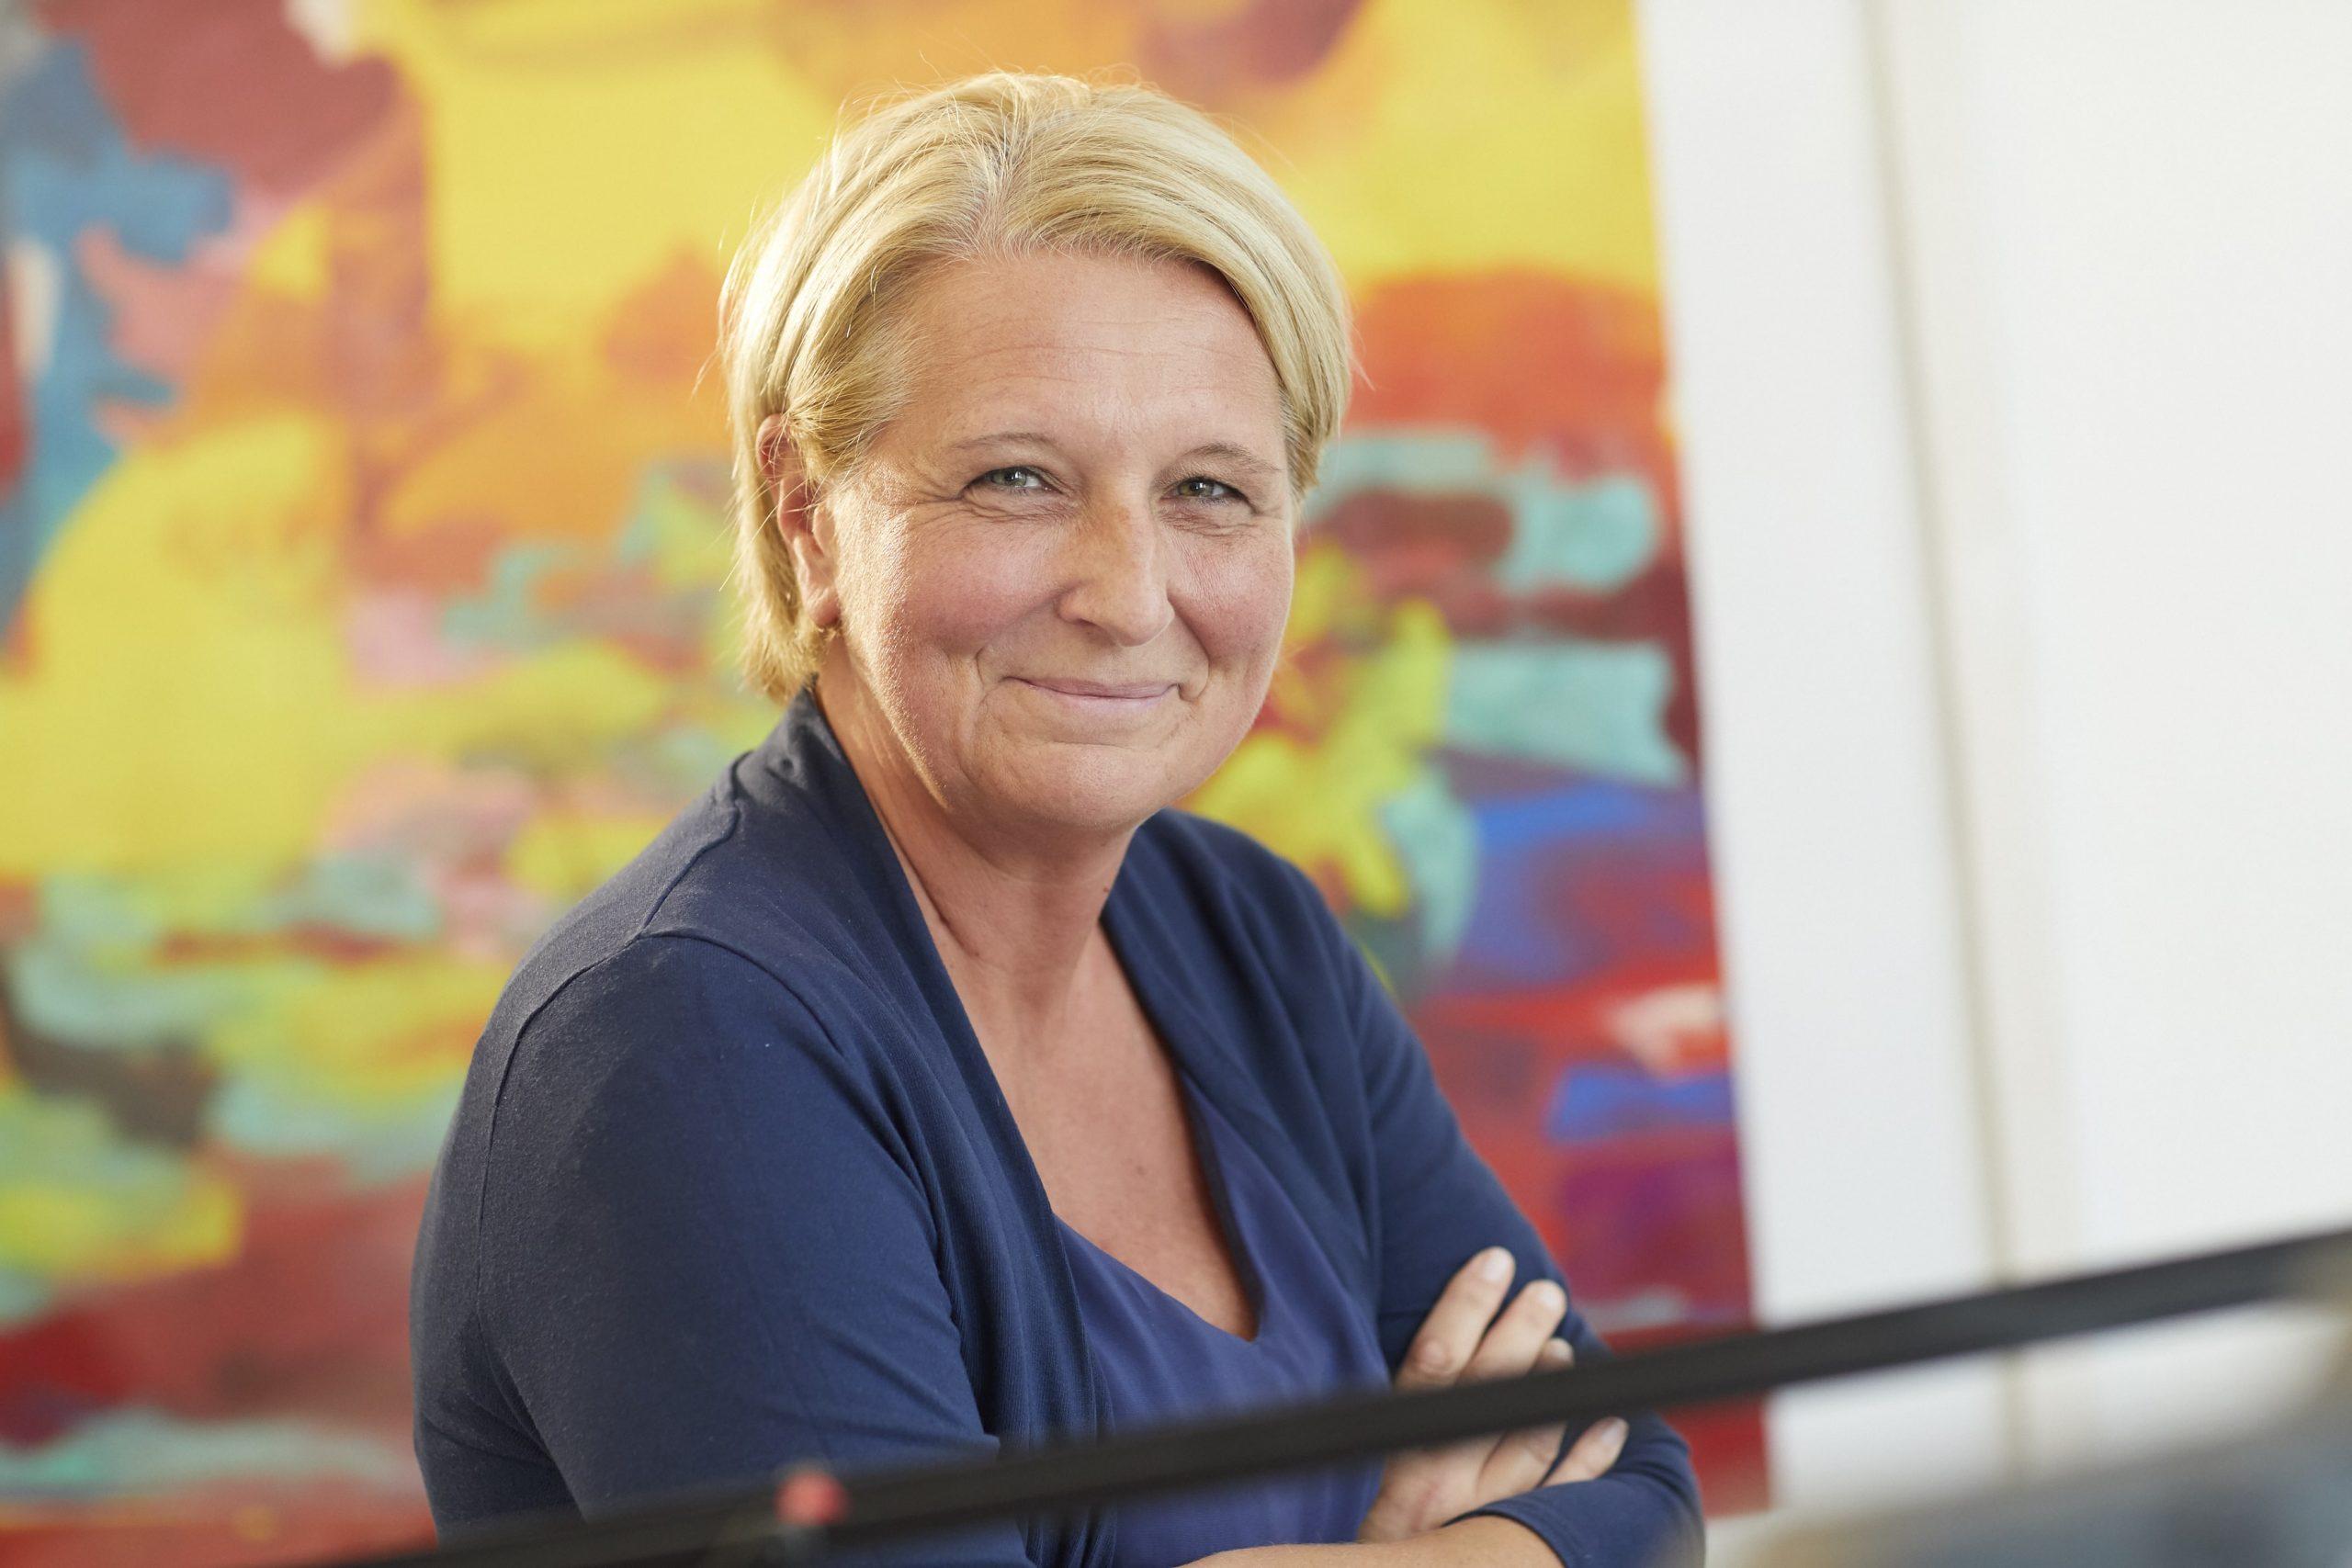 Sylvia Haas - Steuerberater Eggeling und Partner in Düsseldorf